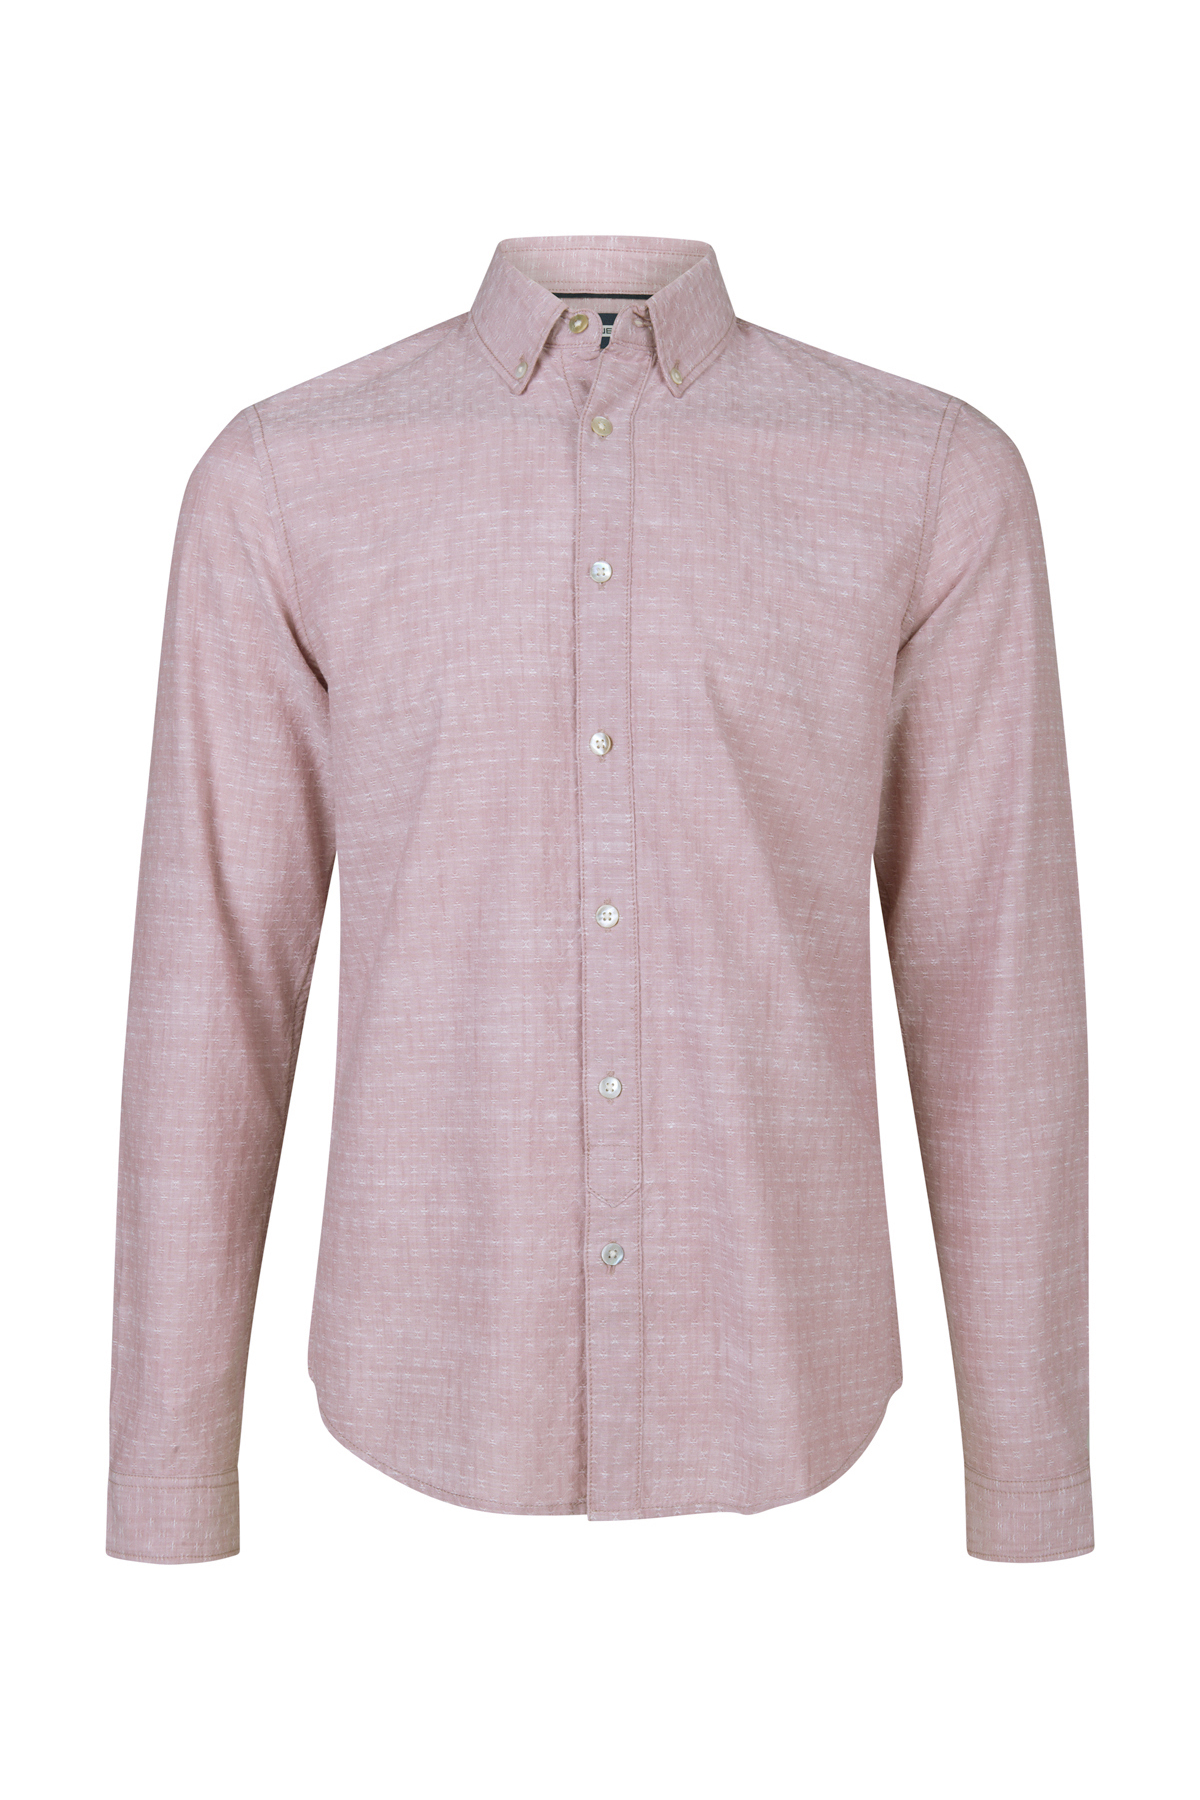 Heren Overhemd Roze.Heren Slim Fit Dessin Overhemd 94406603 We Fashion